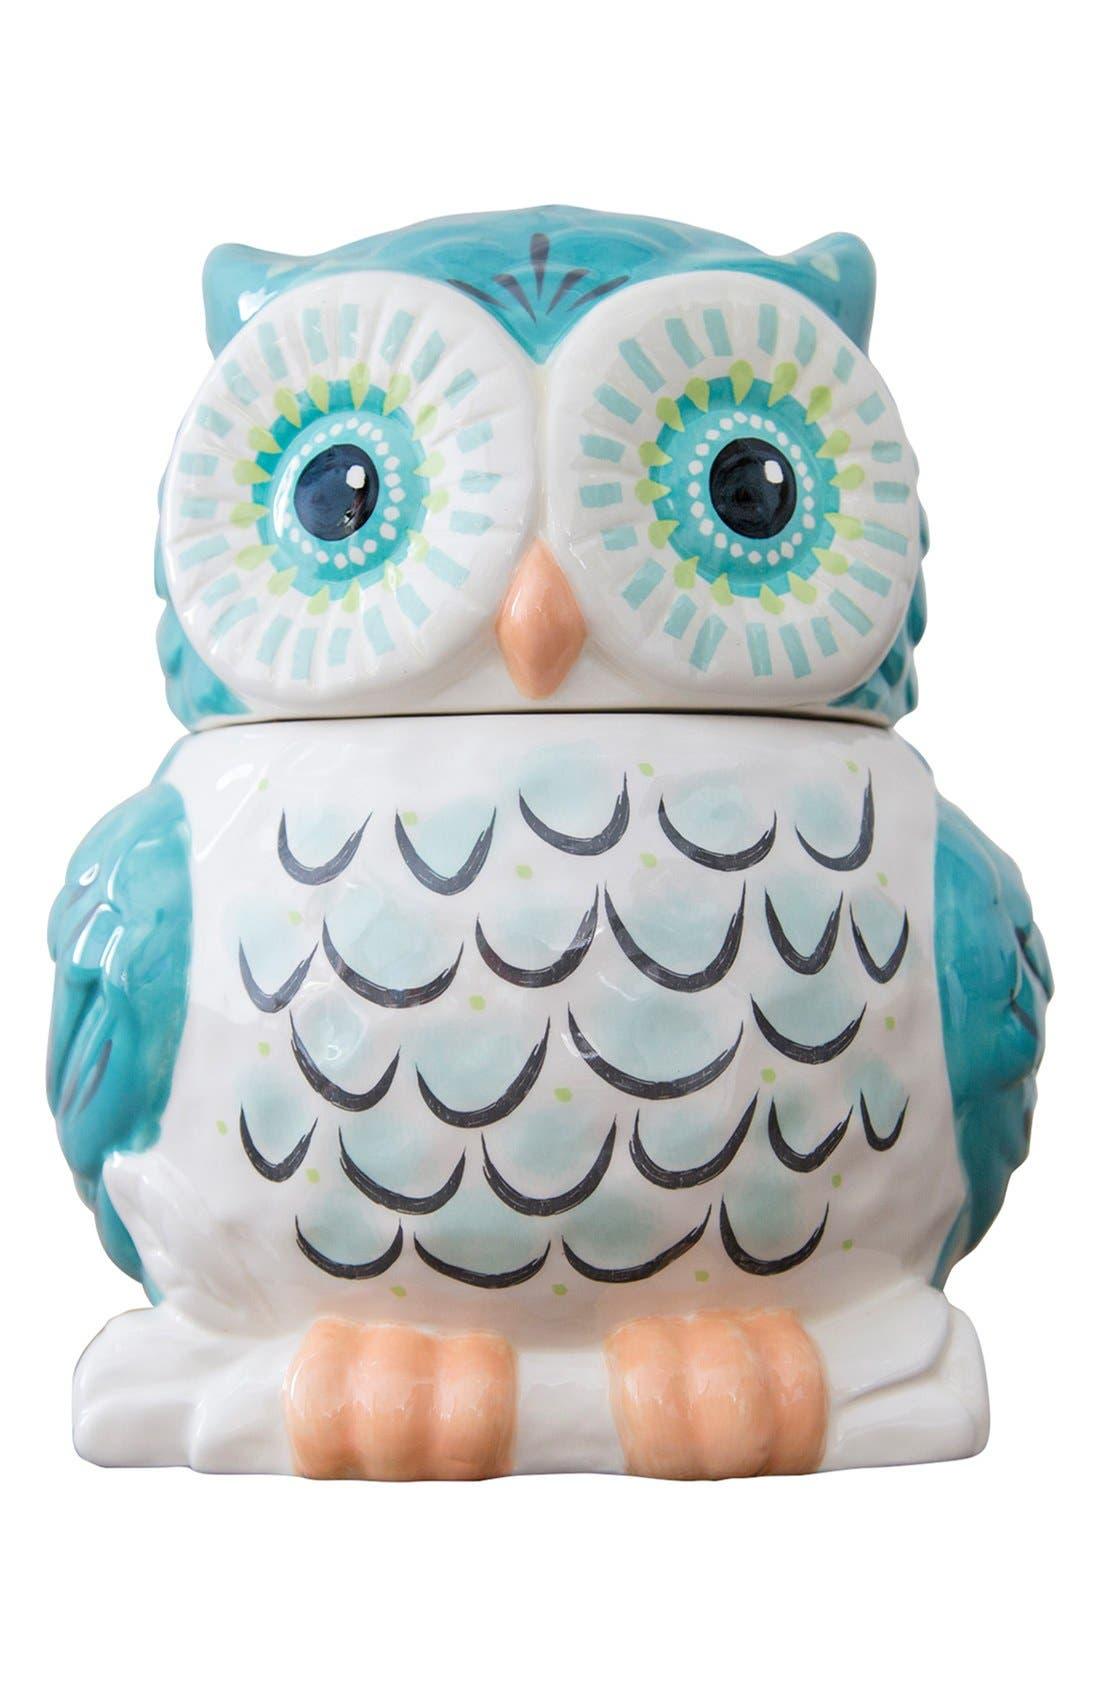 NATURAL LIFE,                             Ceramic Owl Cookie Jar,                             Main thumbnail 1, color,                             900